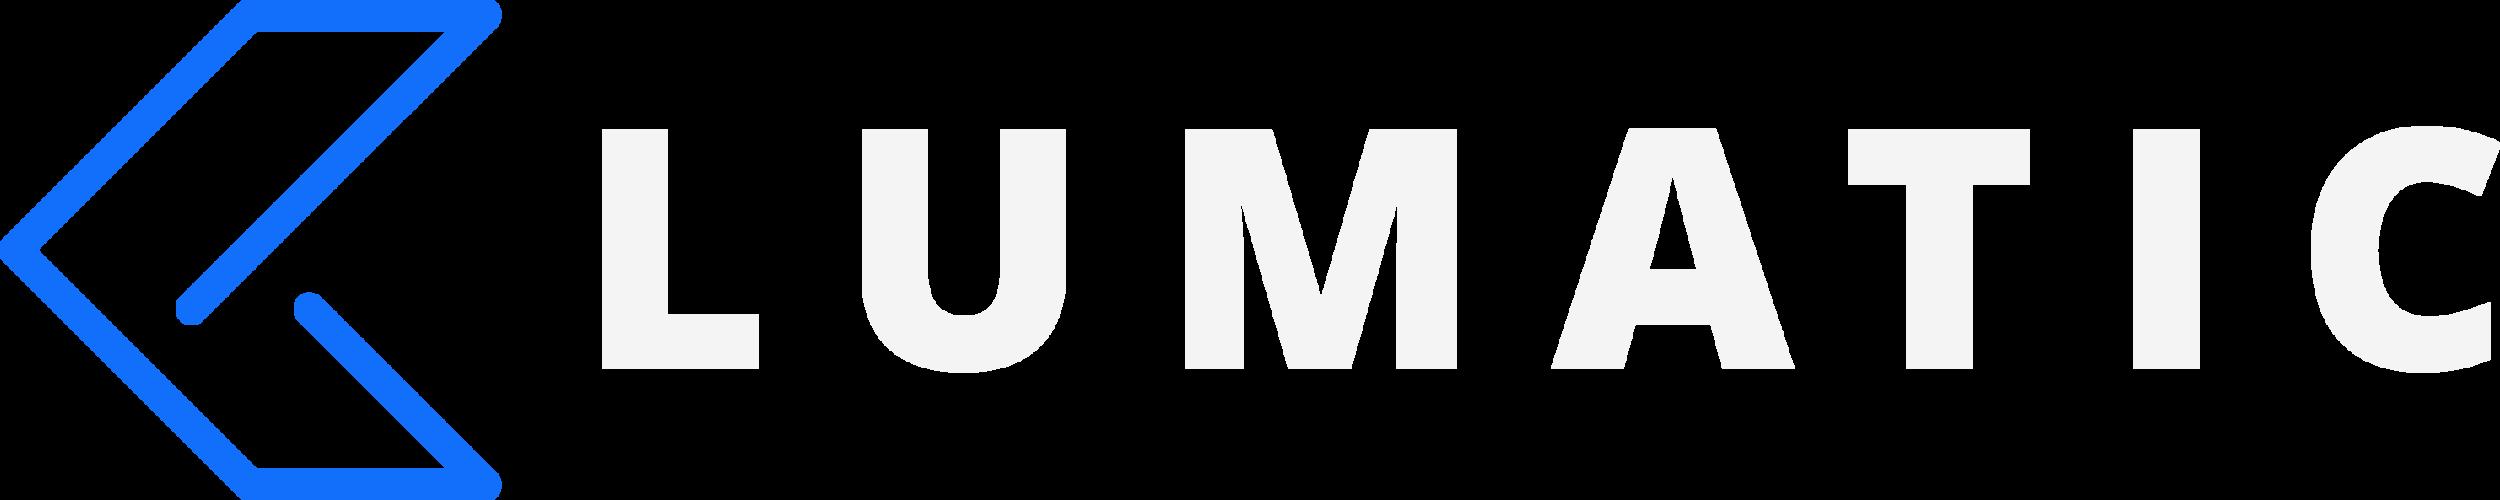 Lumatic Logo (Horizontal on Alpha).png